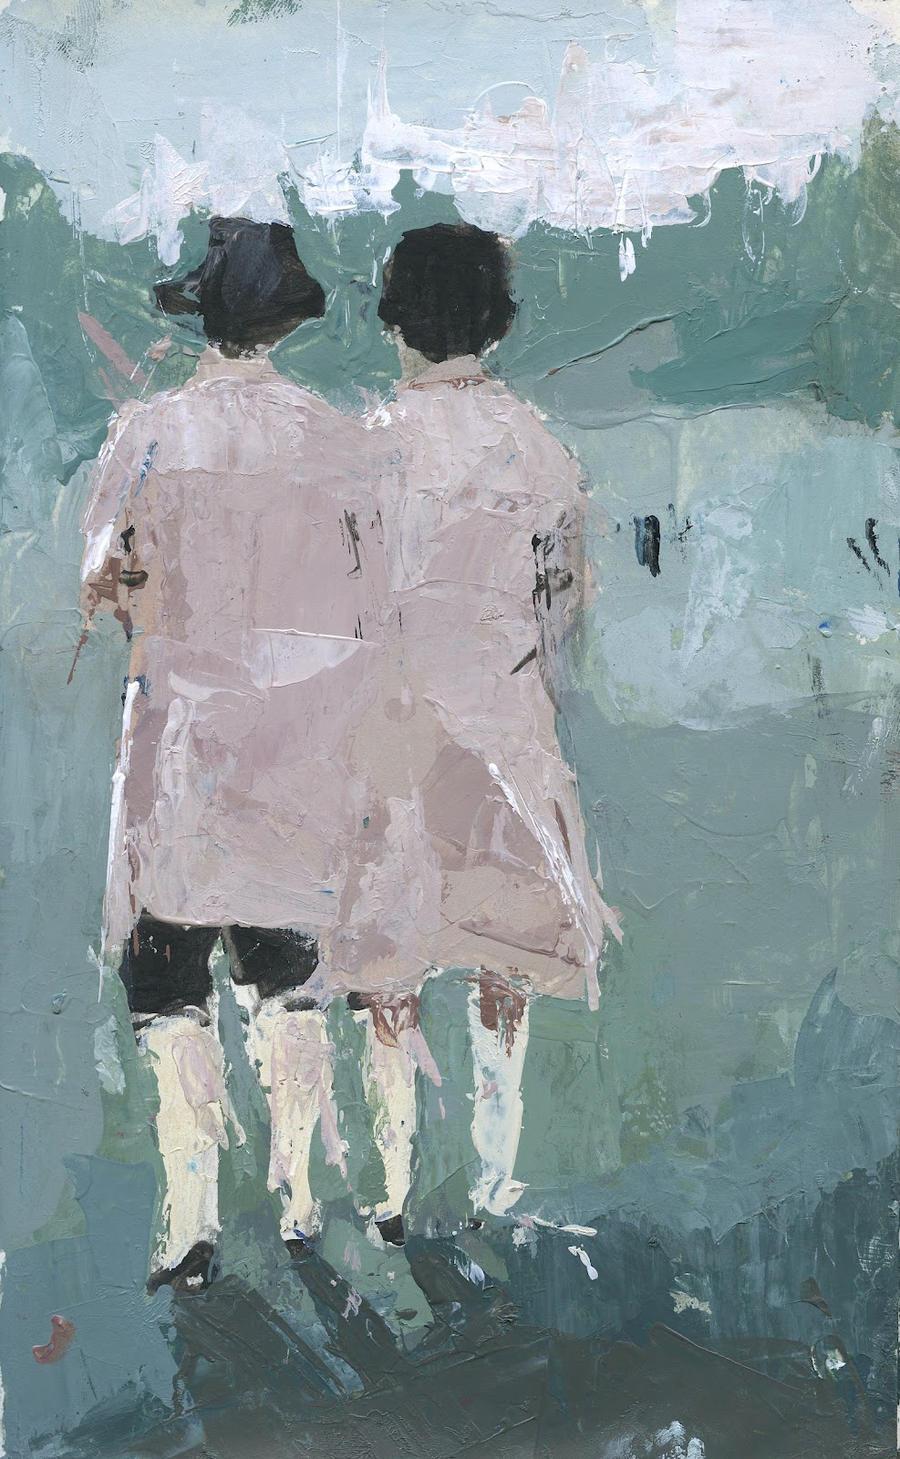 Twins. by cameronasao